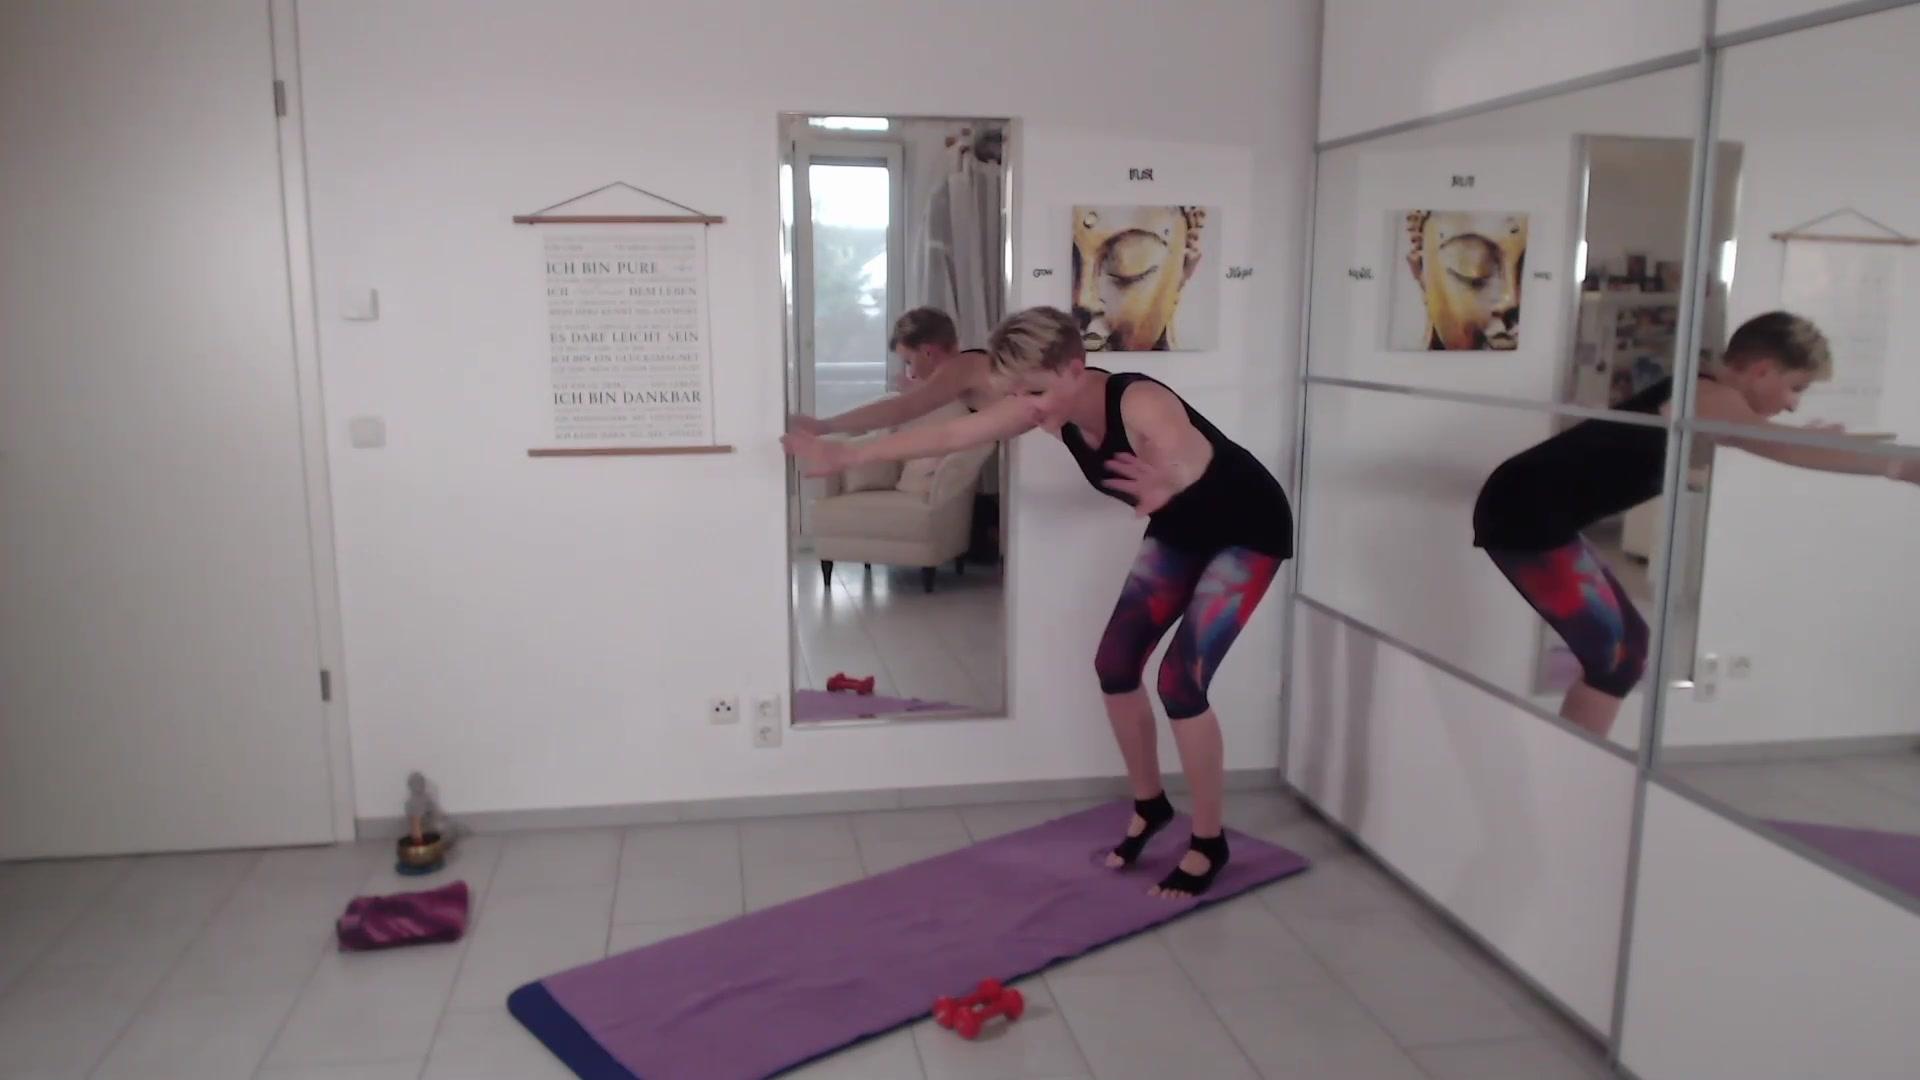 Pilates-Live – Aufnahme vom 05.05.2021